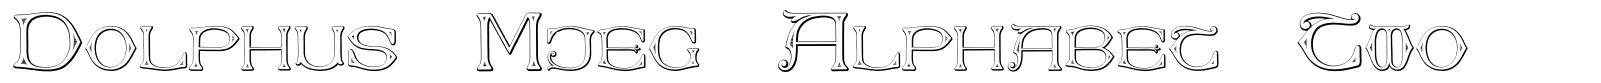 Dolphus-Mieg Alphabet Two